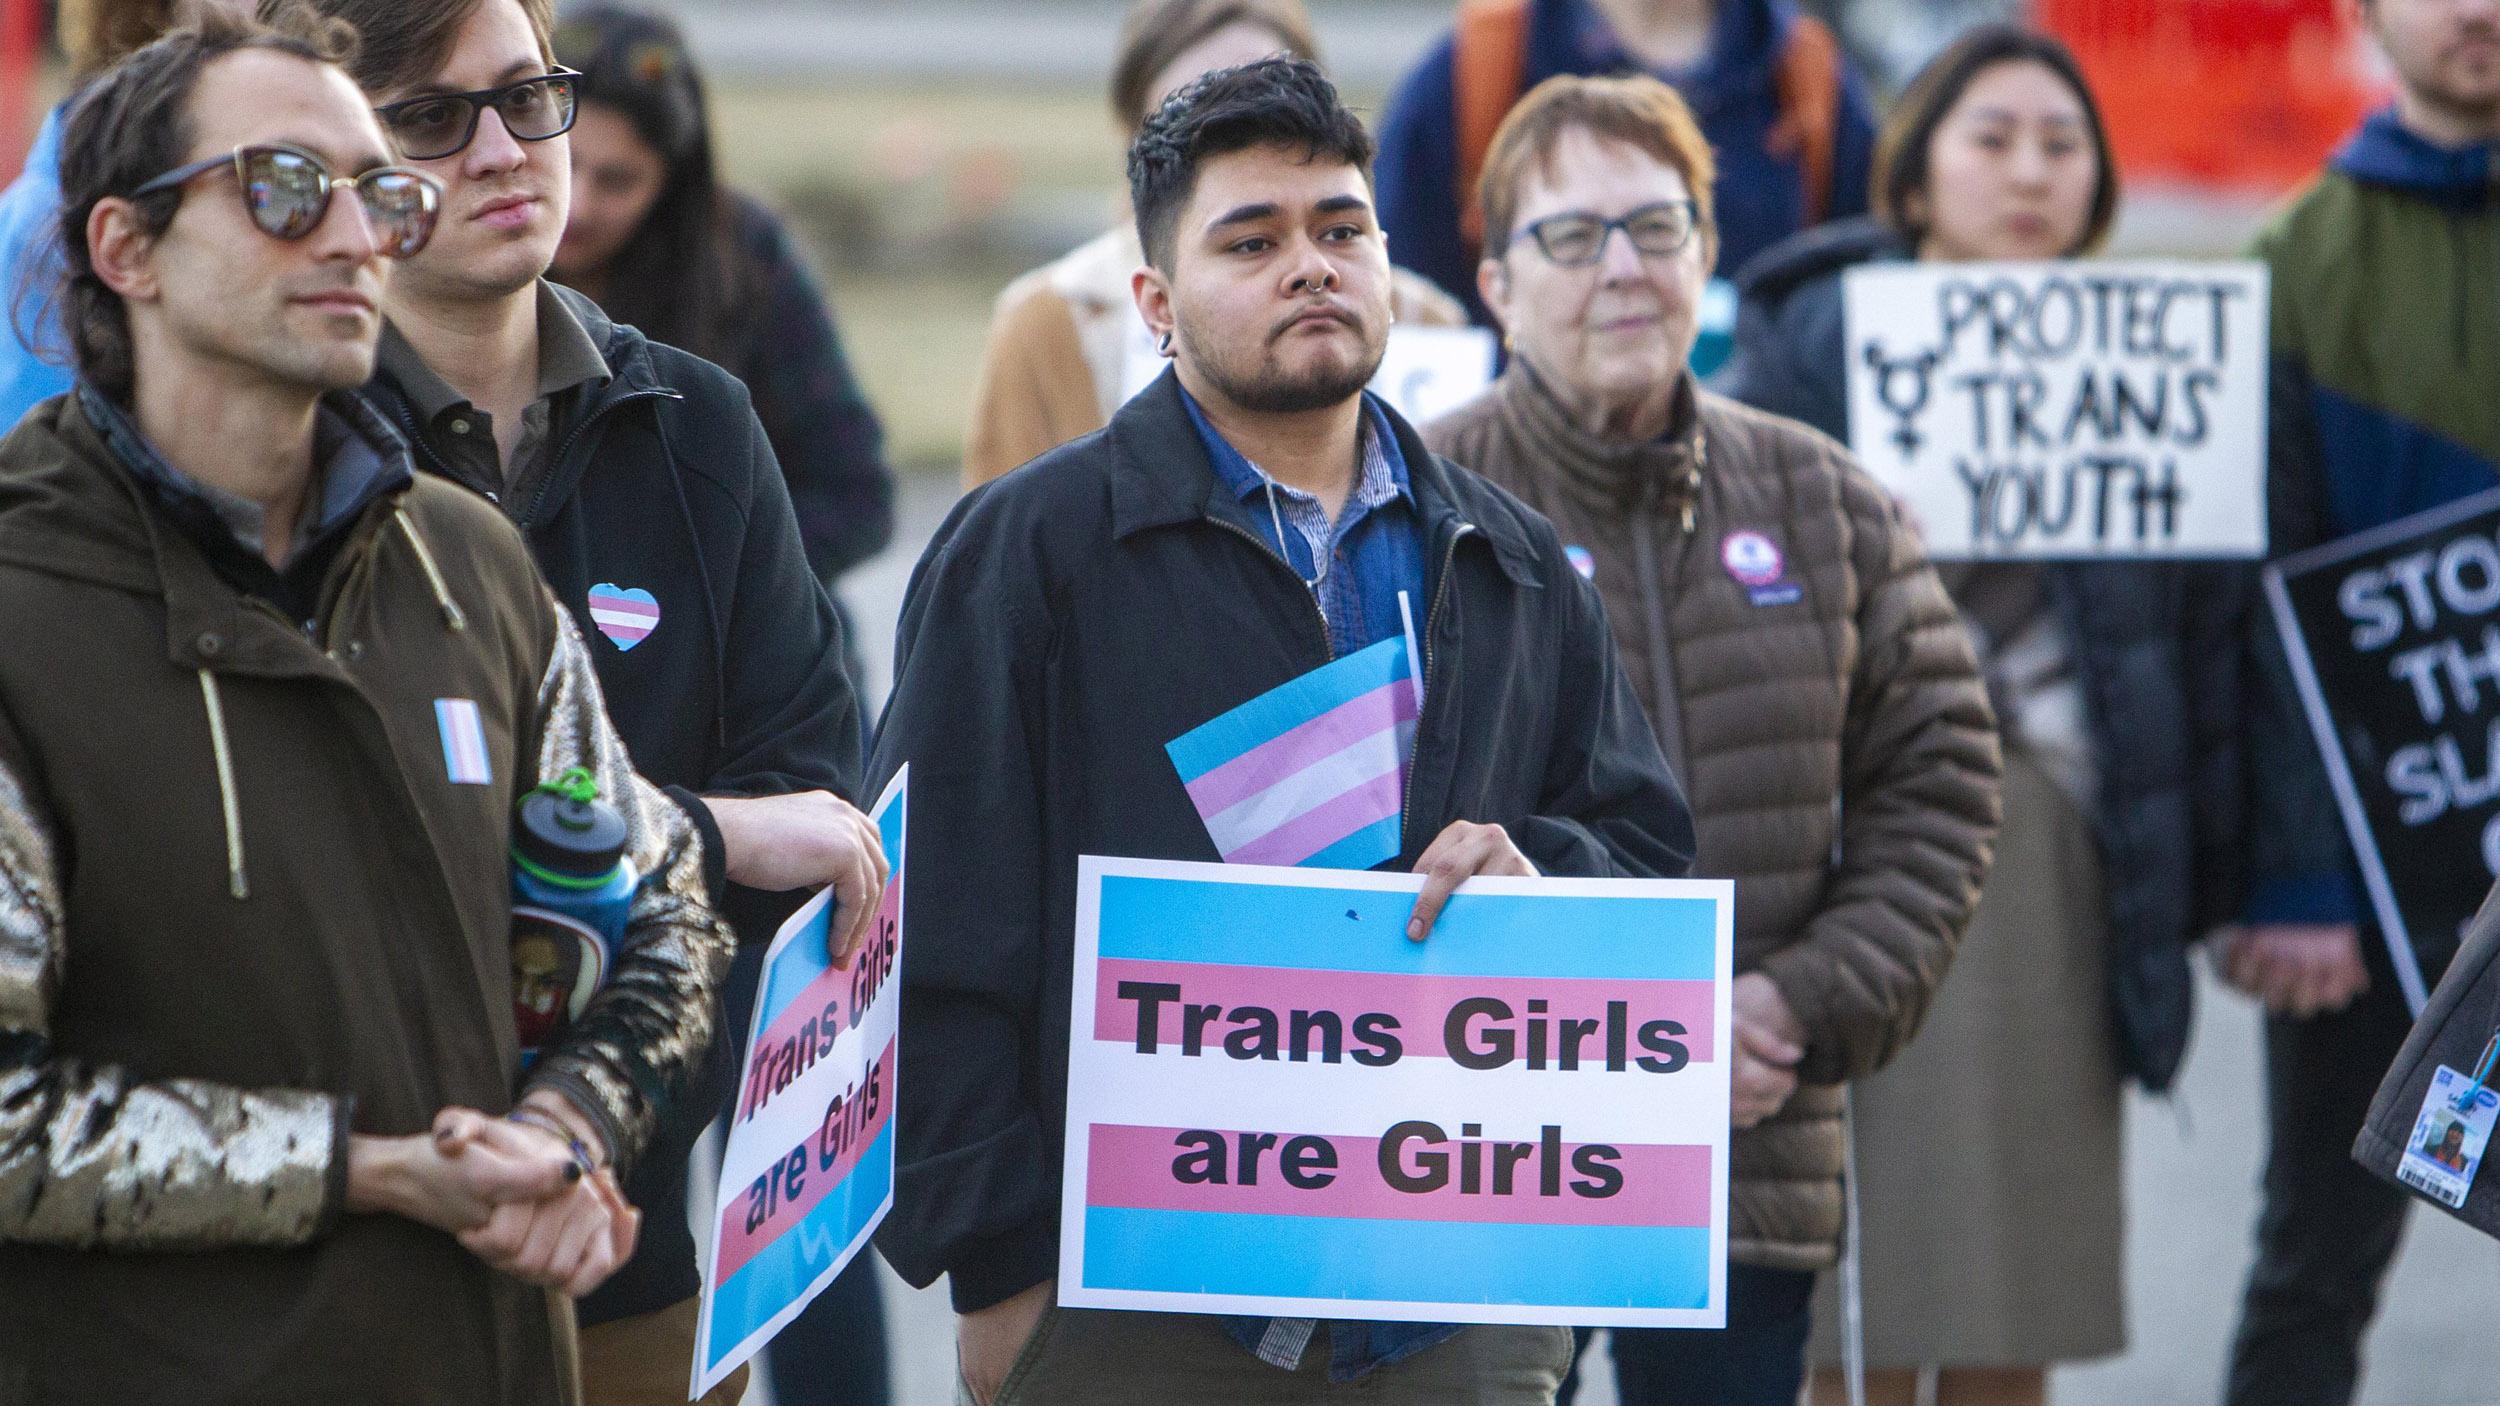 Anti-transgender birth certificate law violates order, judge rules